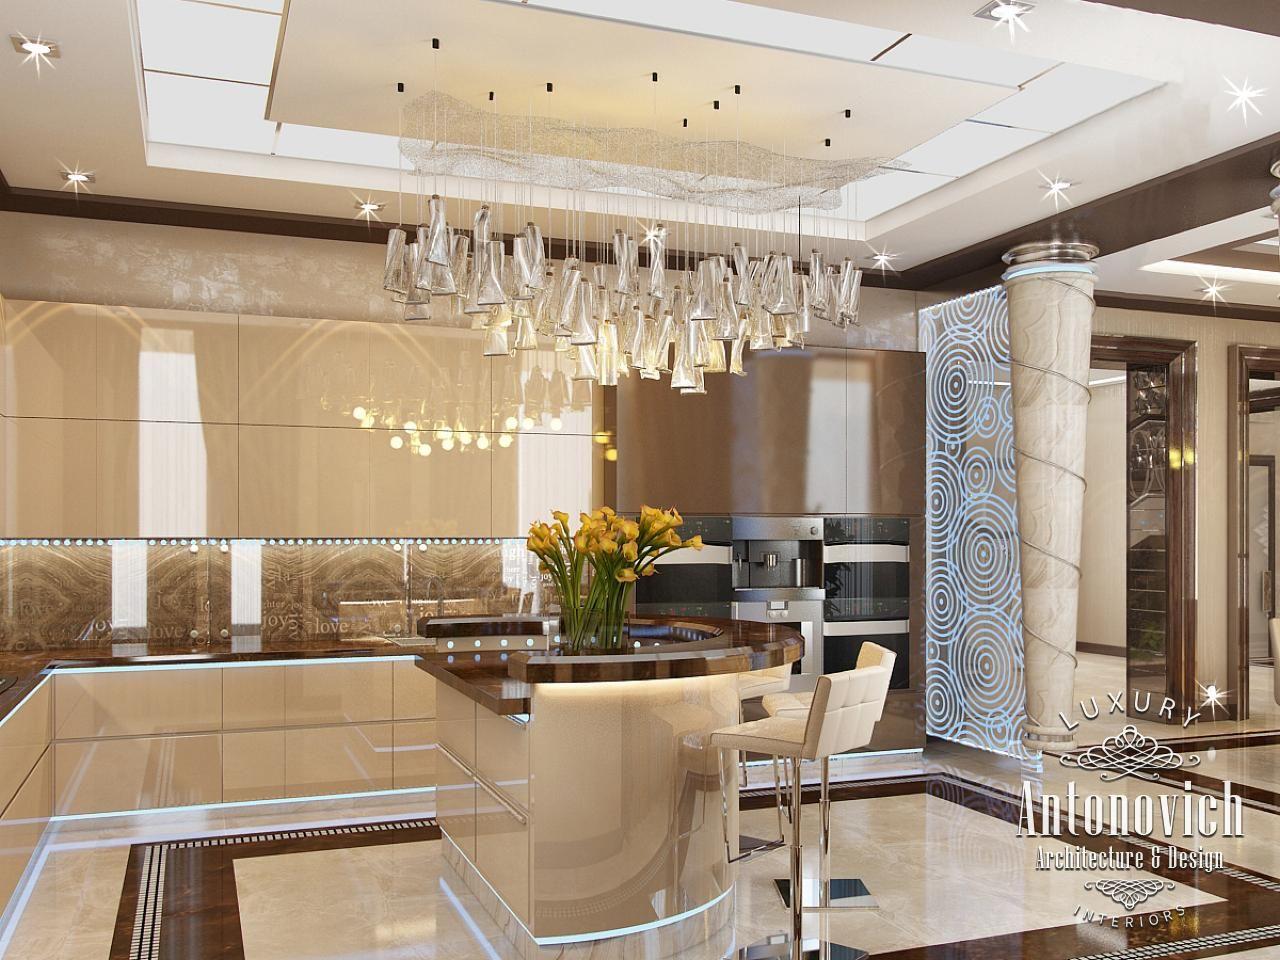 Kitchen Design In Dubai Luxury Kitchen In A Contemporary Style